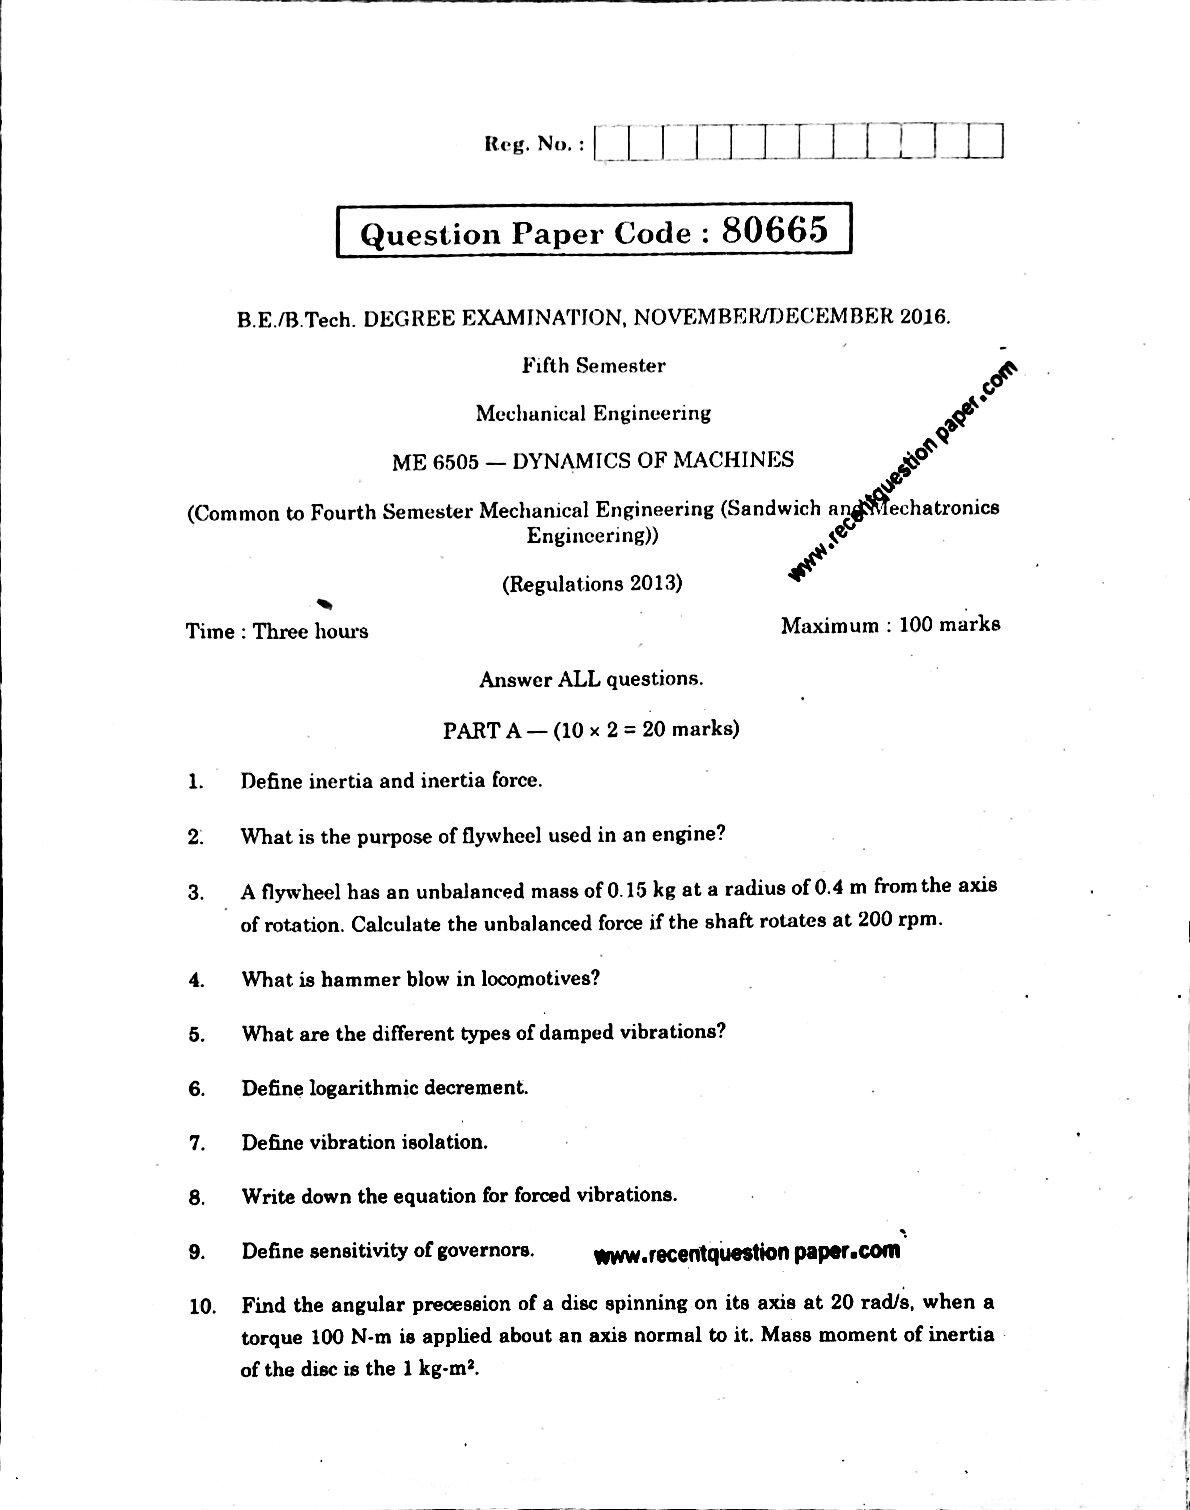 ME6505 Dynamics Of Machines Anna University Question paper Nov/Dec 2016 Pdf